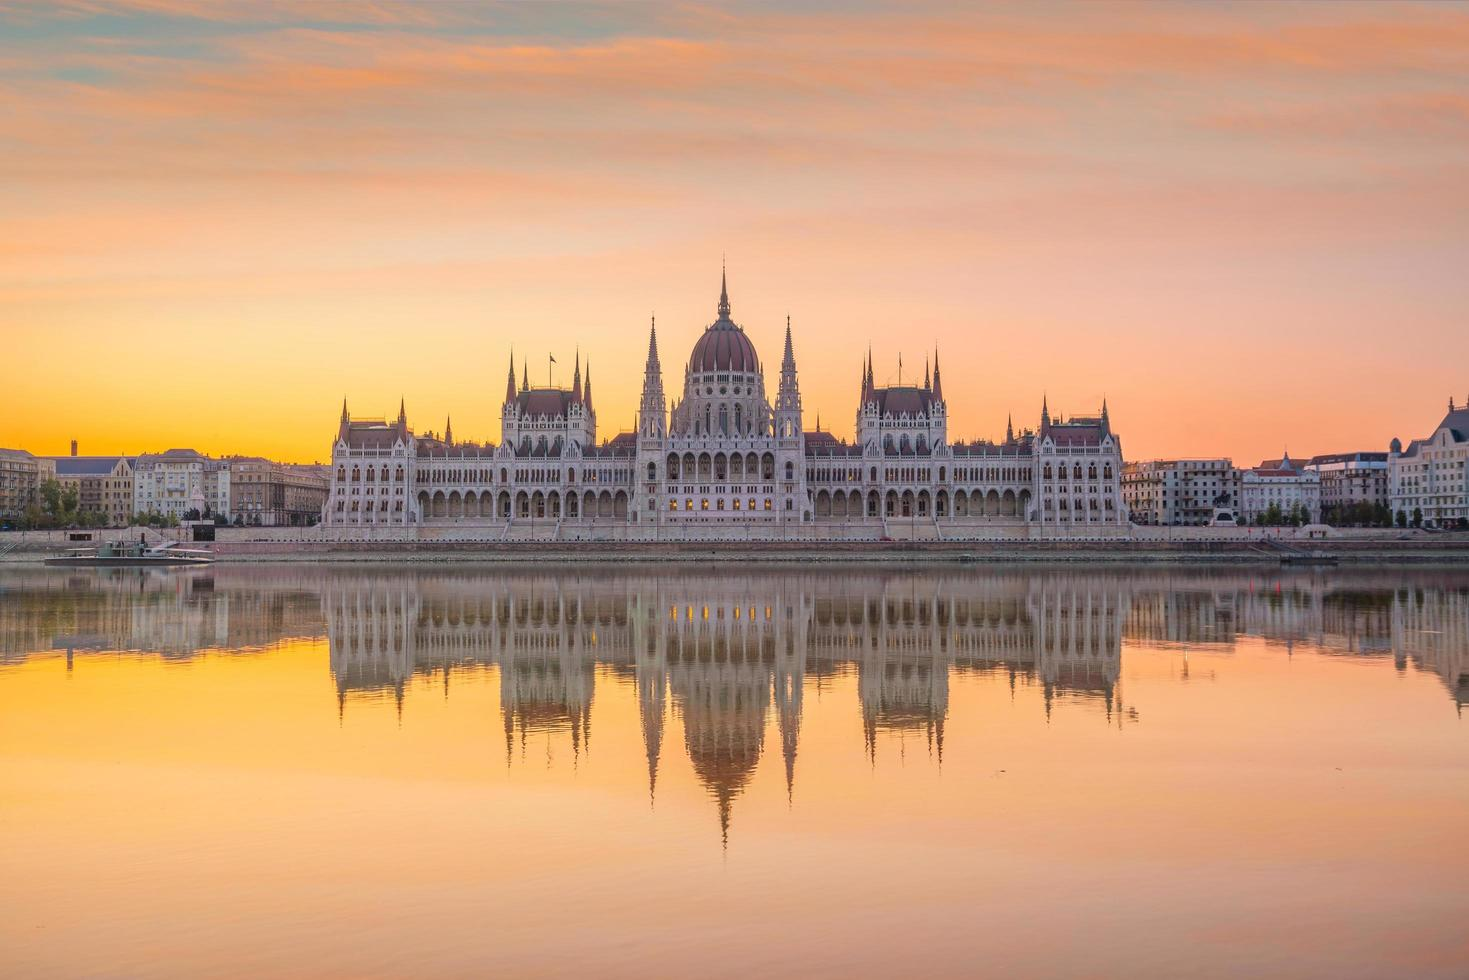 Parliament building at sunrise photo